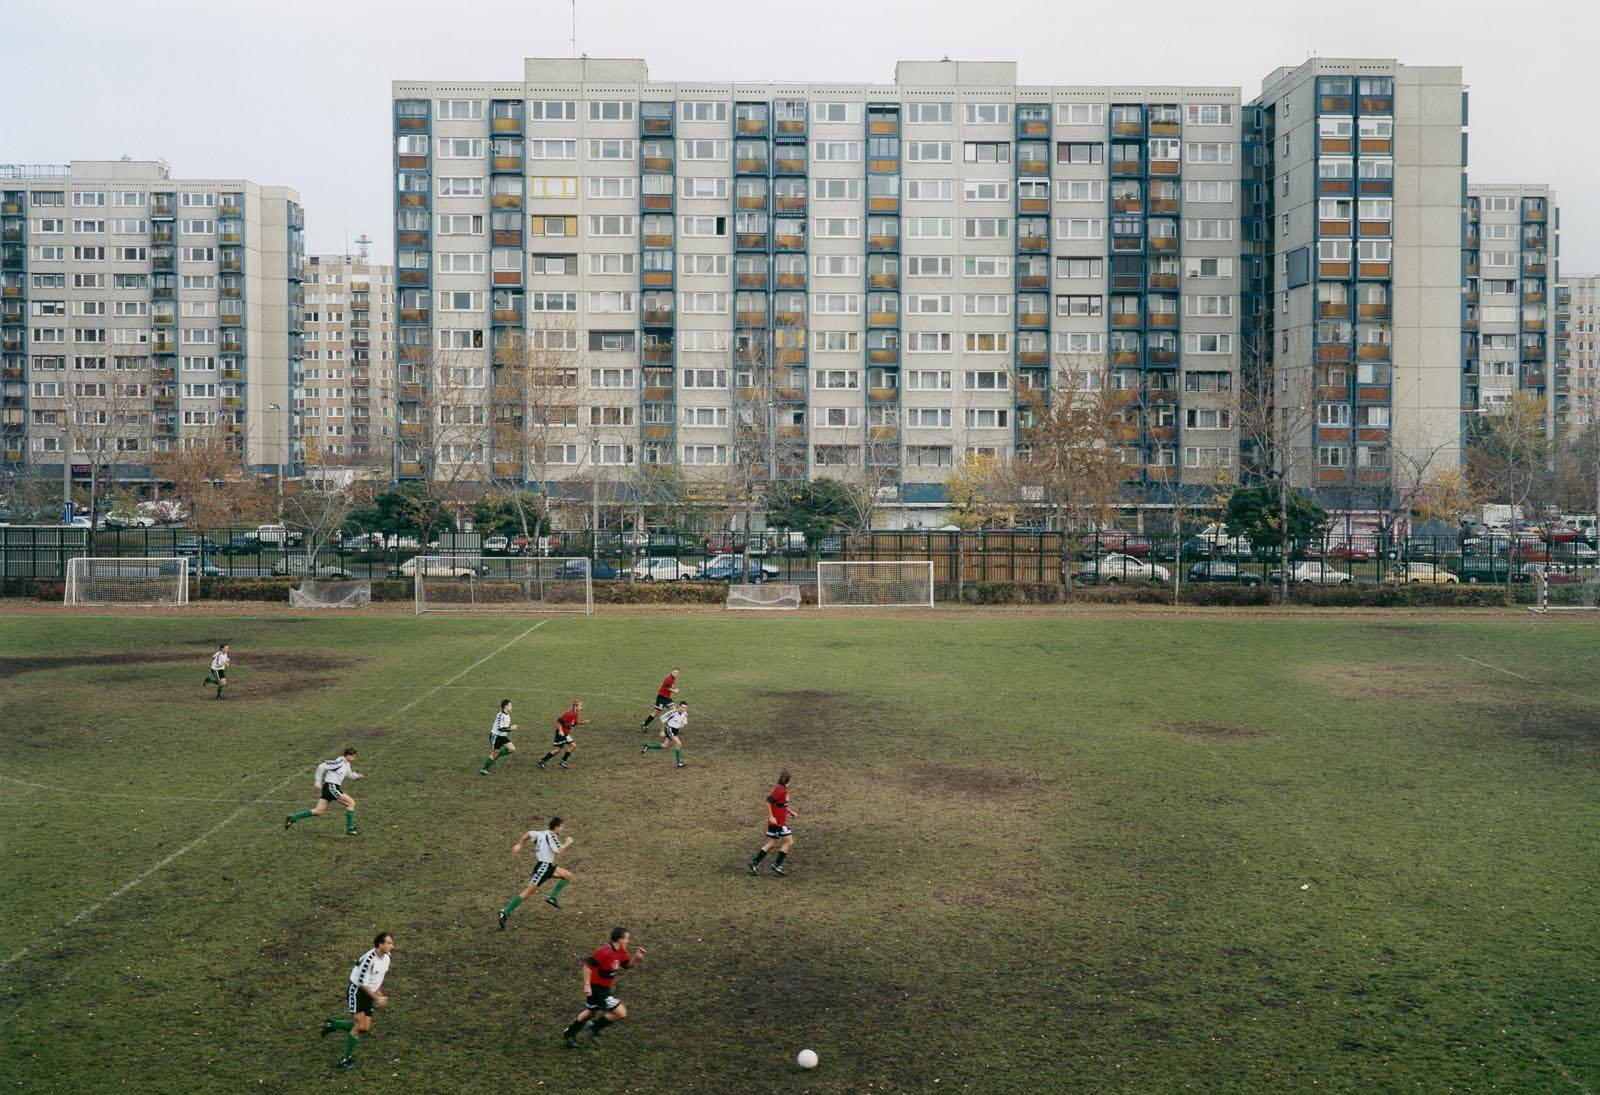 Hans van der Meer, Budapest, Hungary, 2000